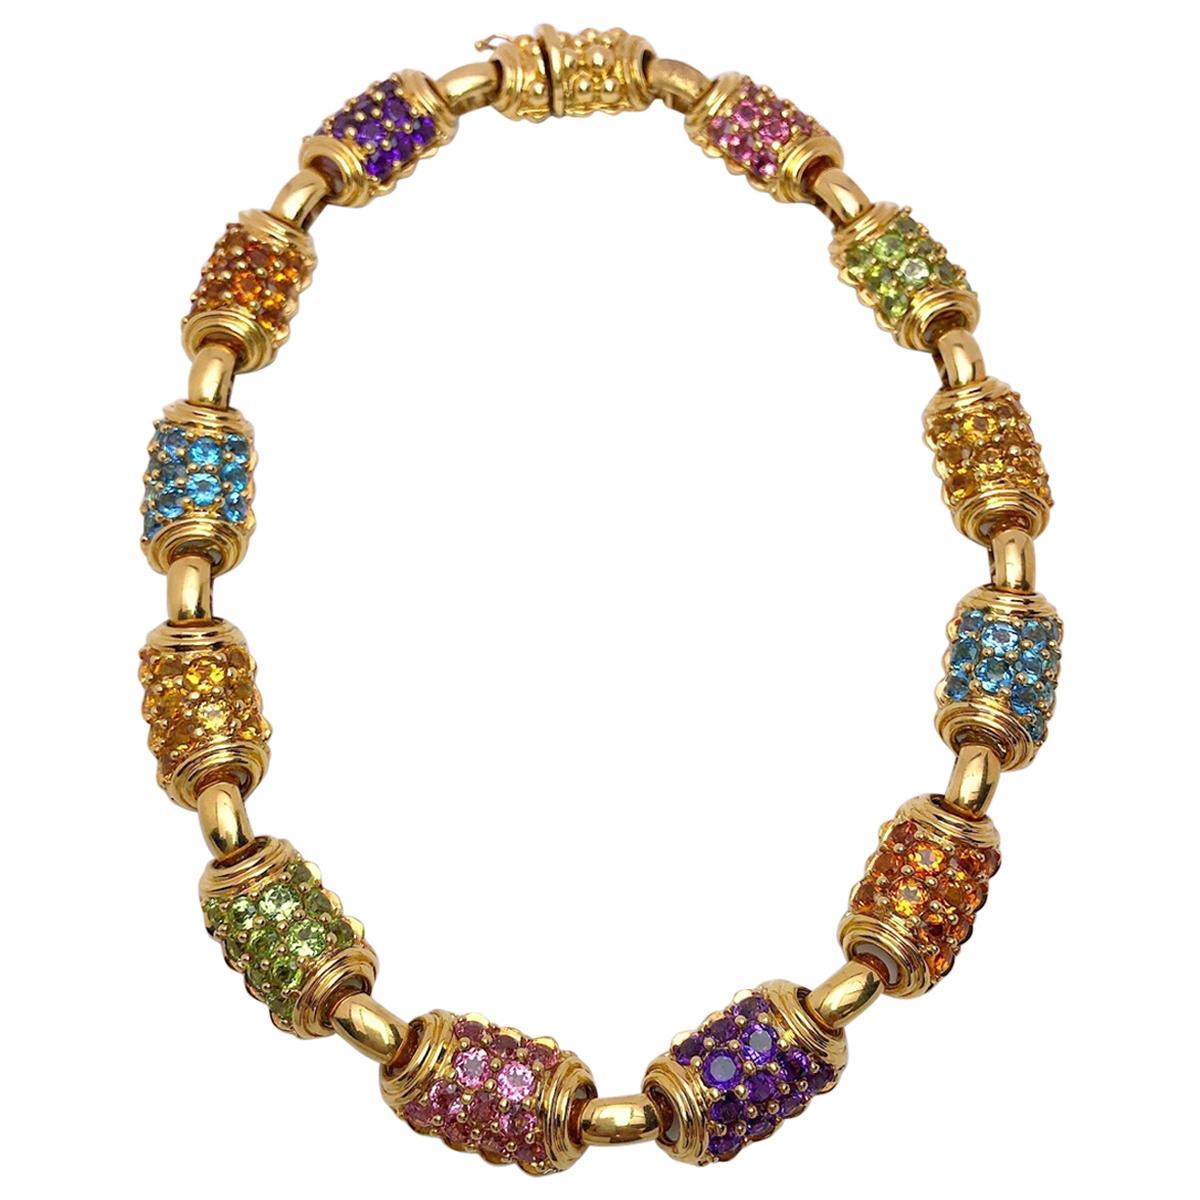 Vaid Roma 18 Karat Yellow Gold and Multicolored Semi Precious Necklace